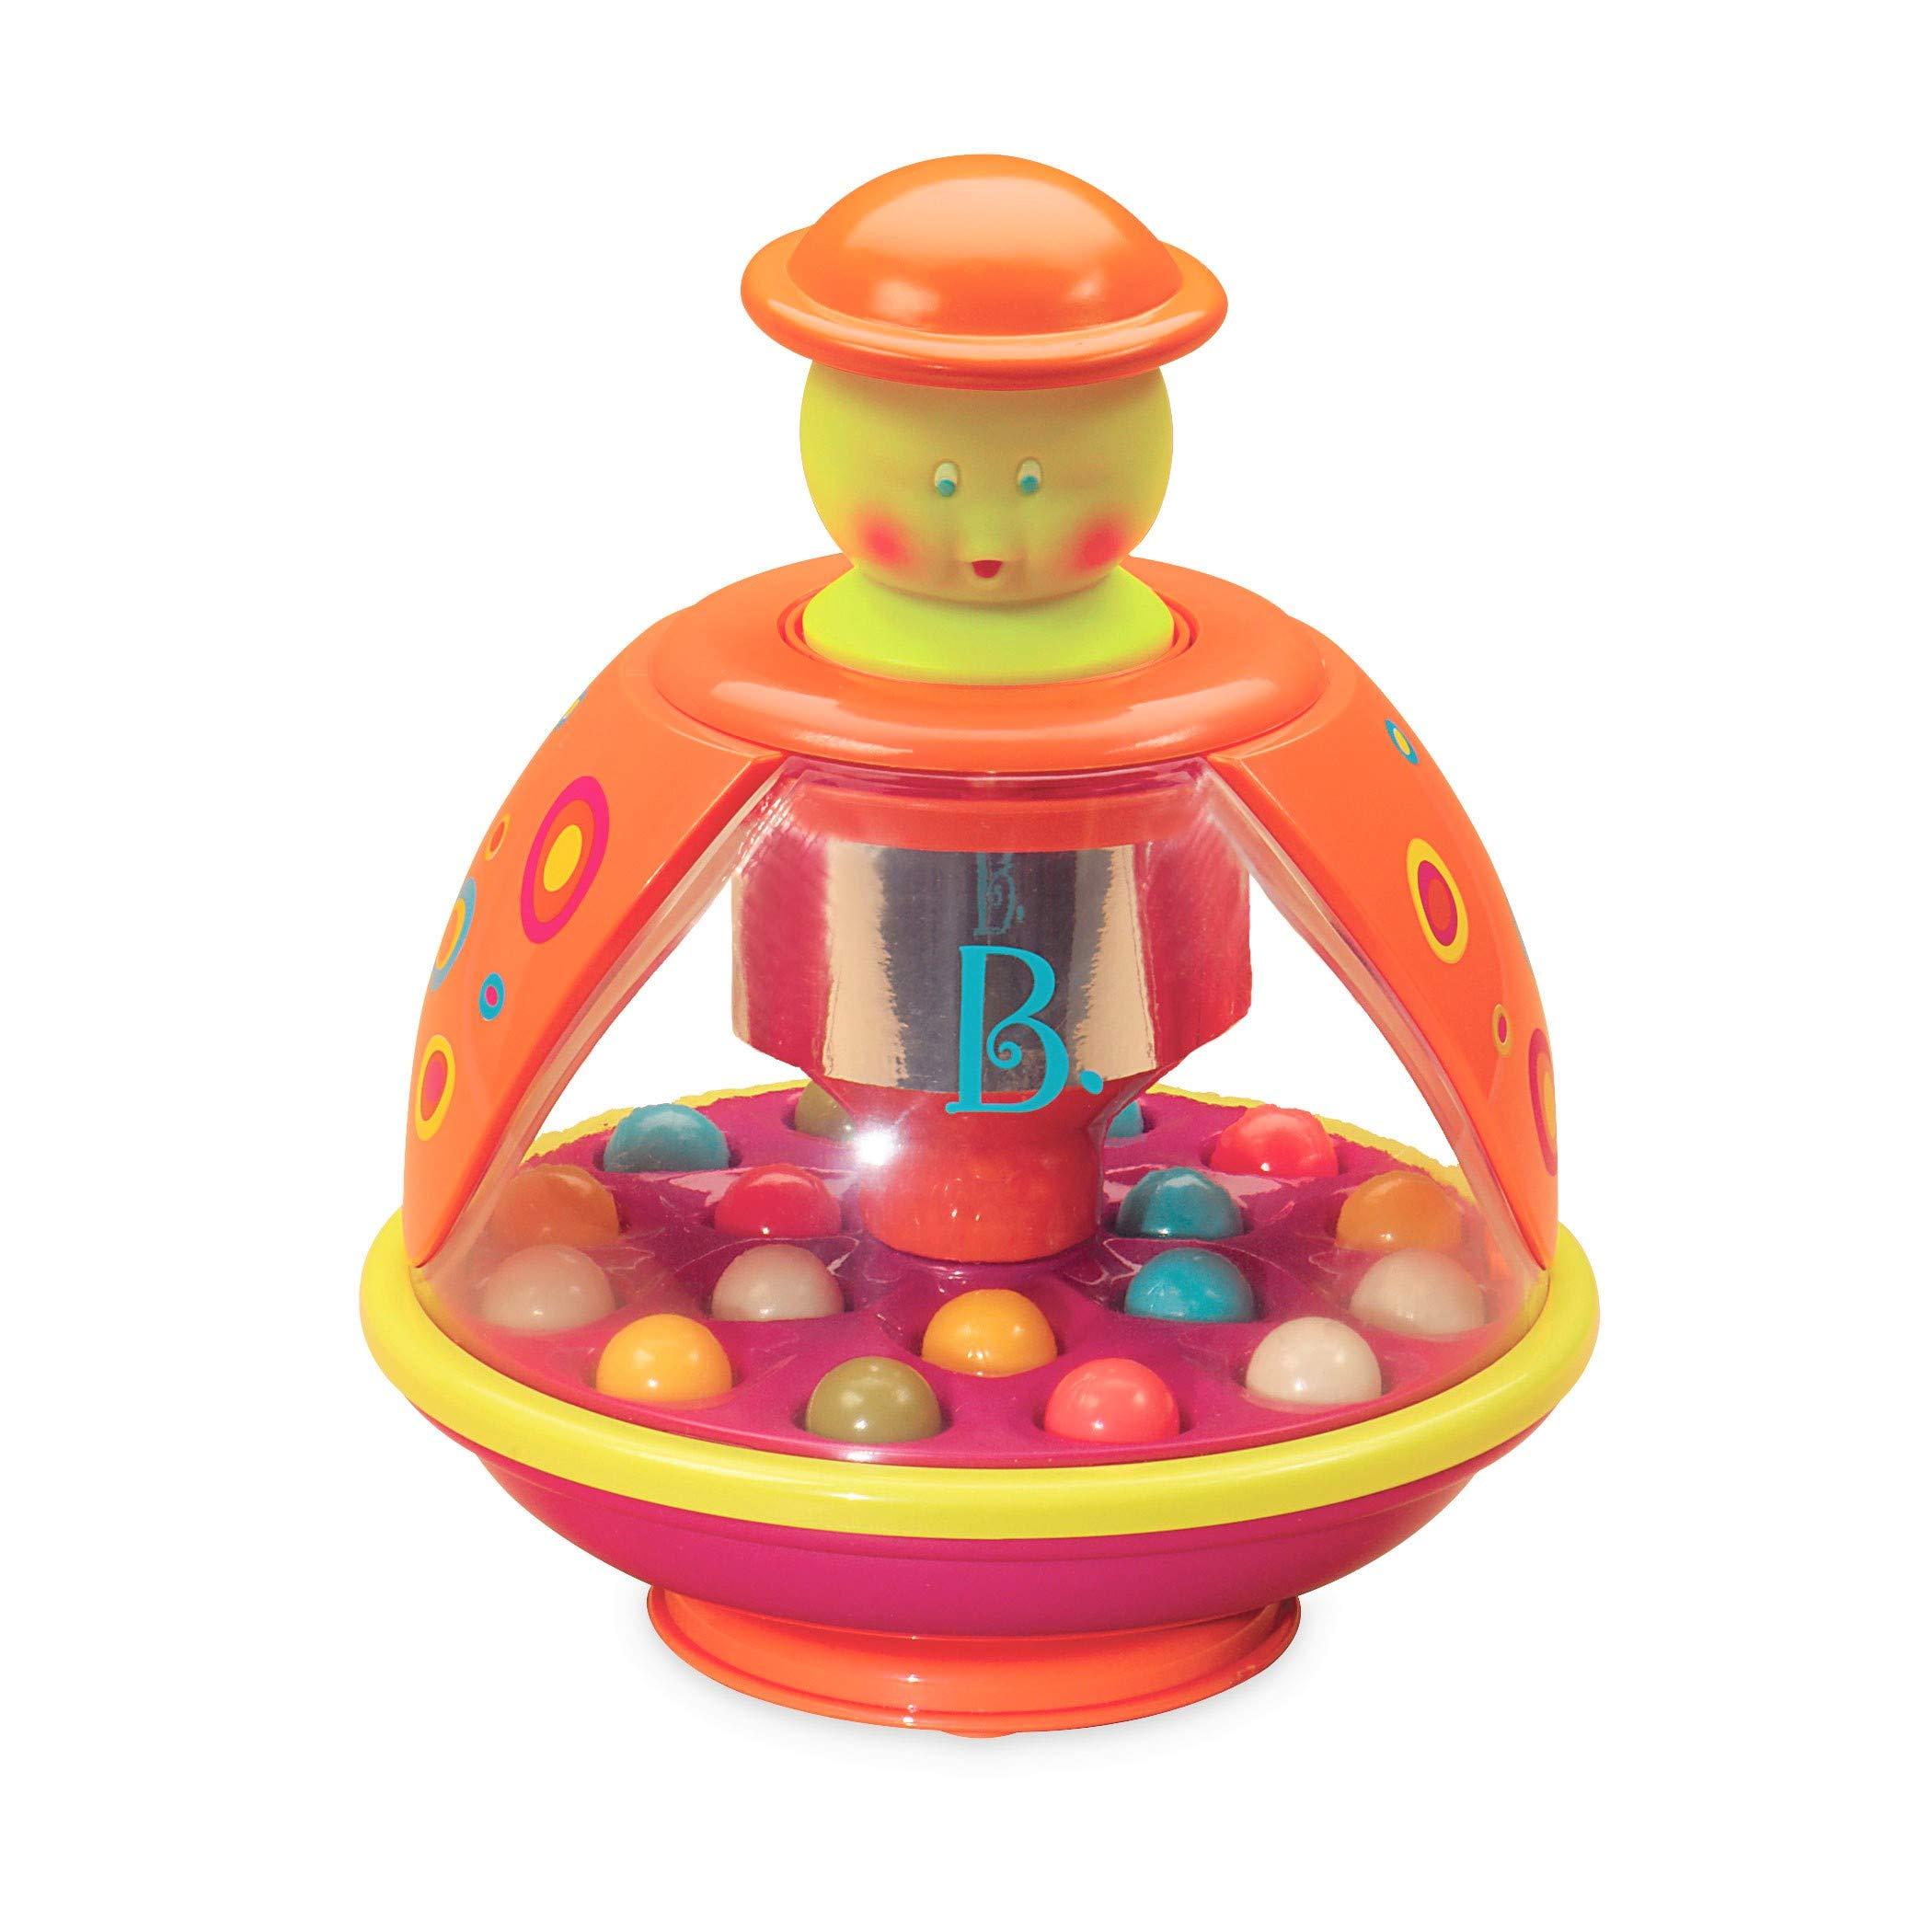 B. Toys – Poppitoppy – Pelotas brincadoras - Juguetes para niños ...